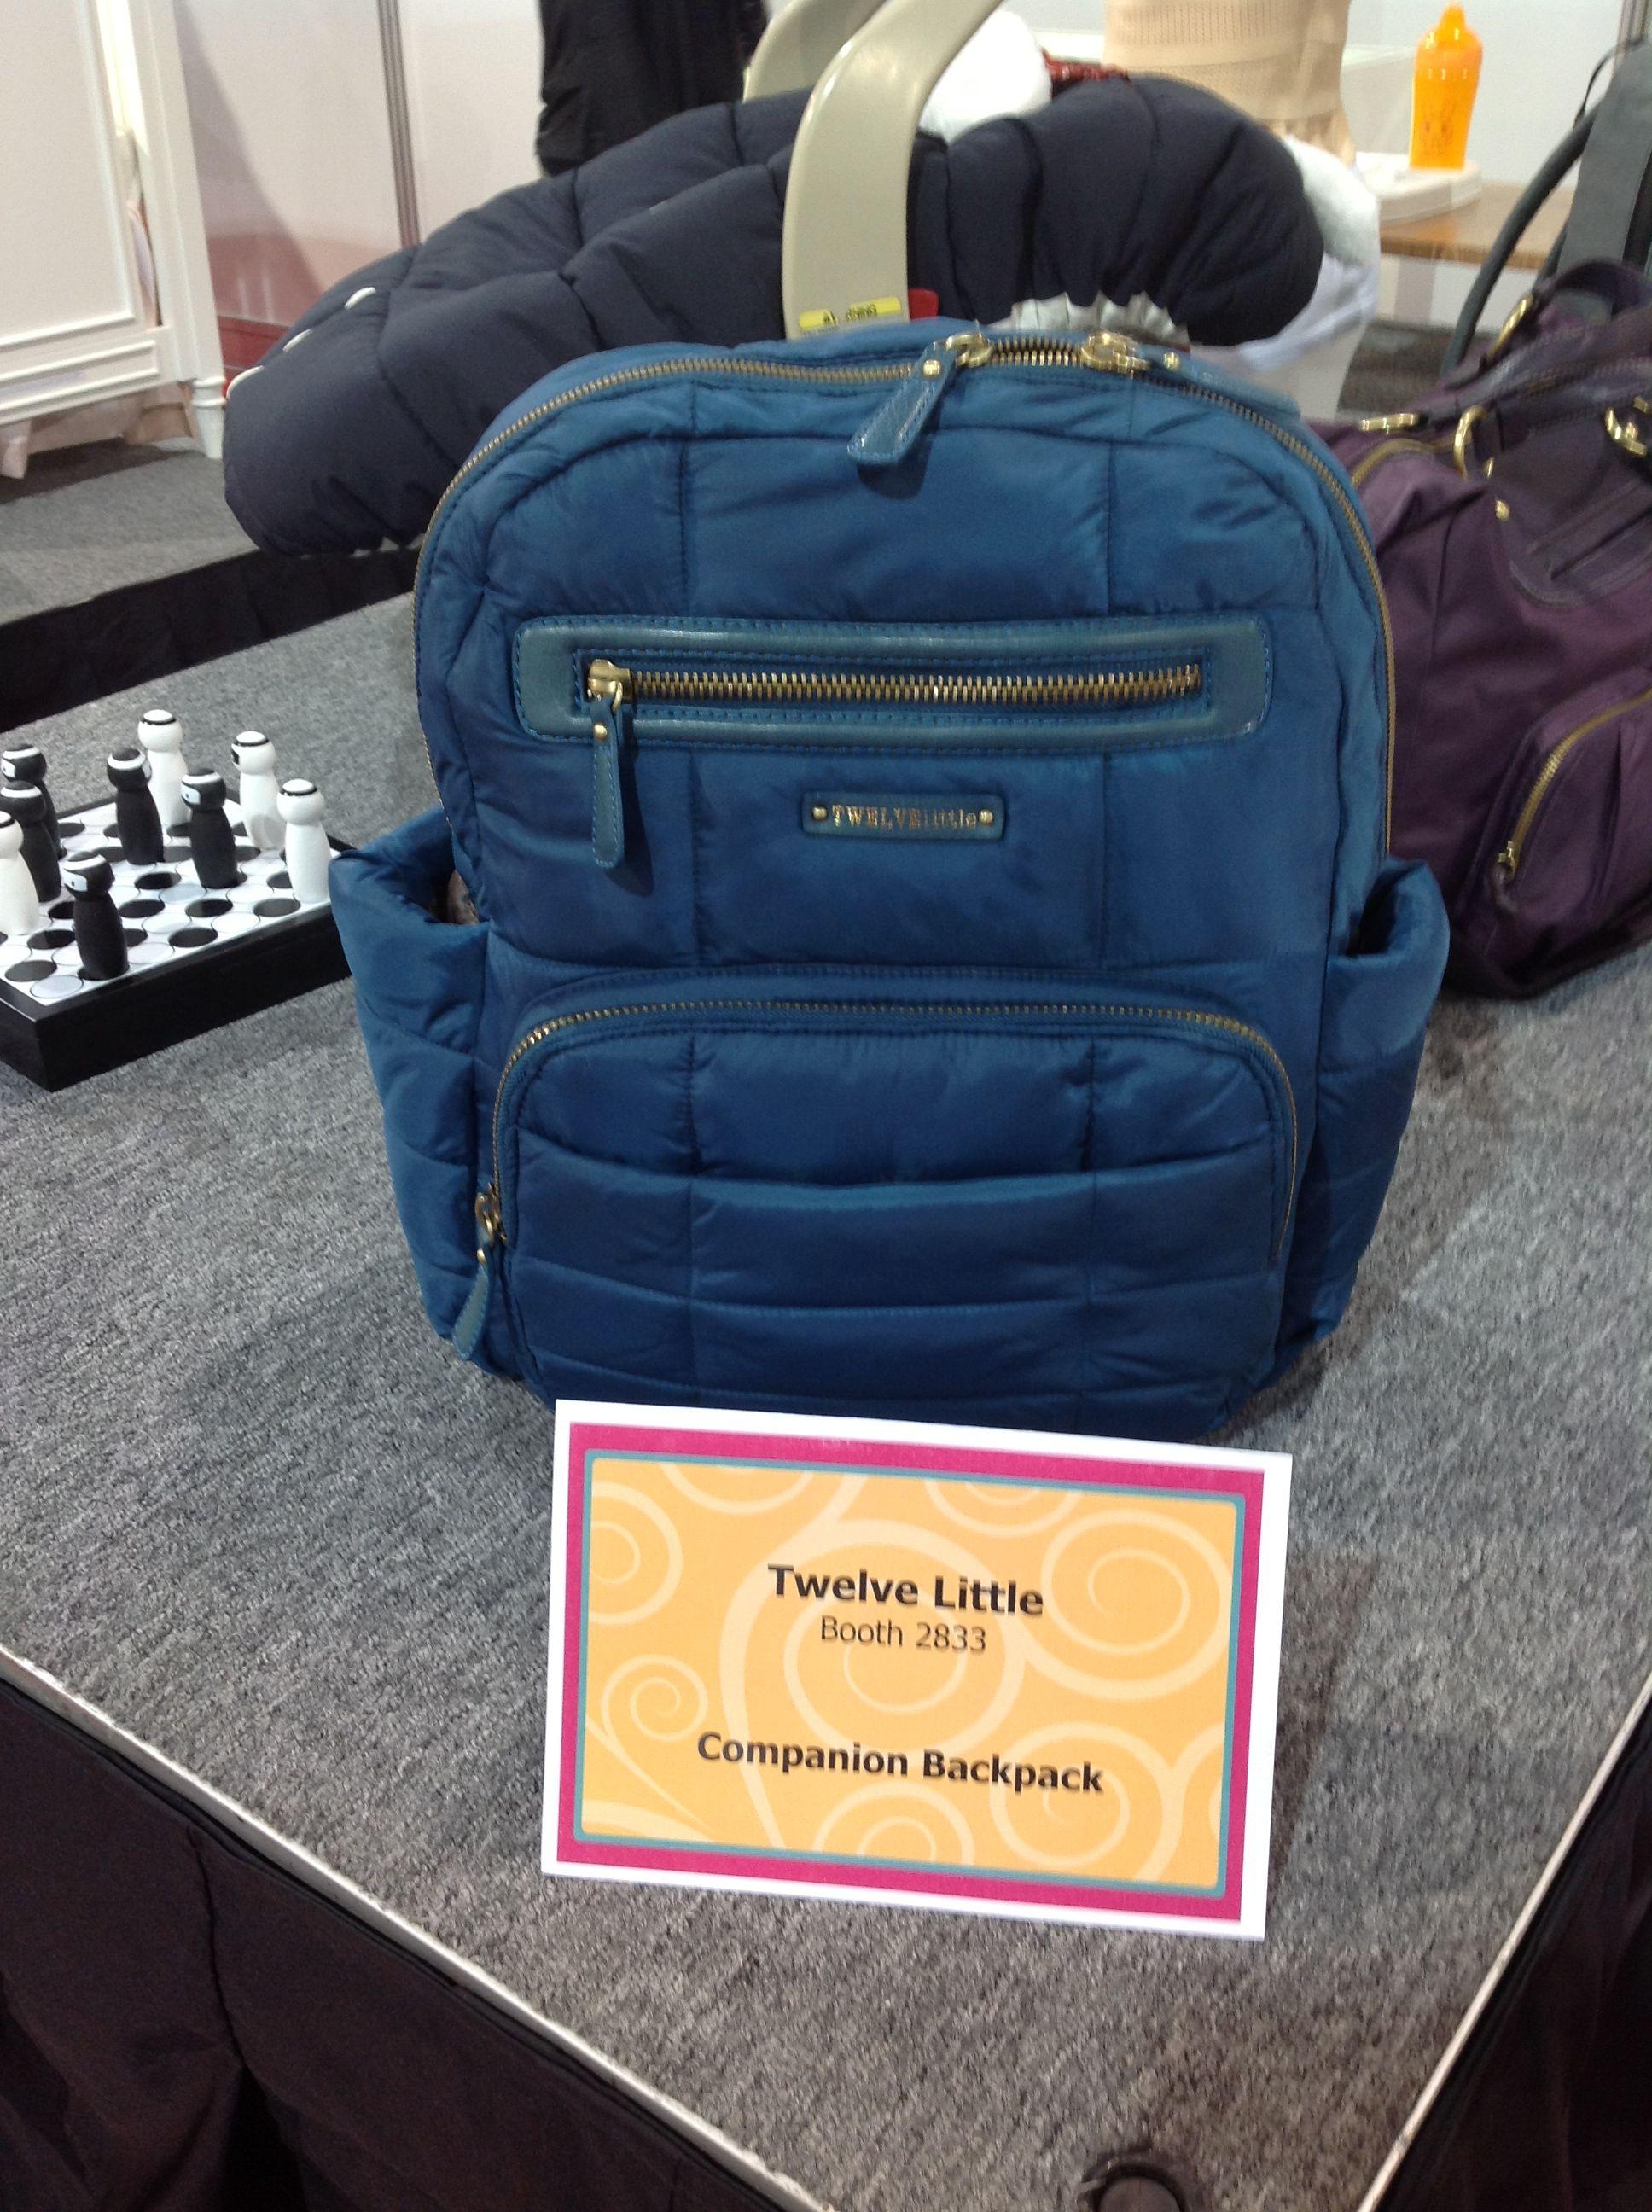 Twelve Little Companion Backpack | 2013 New Product Showcase ...